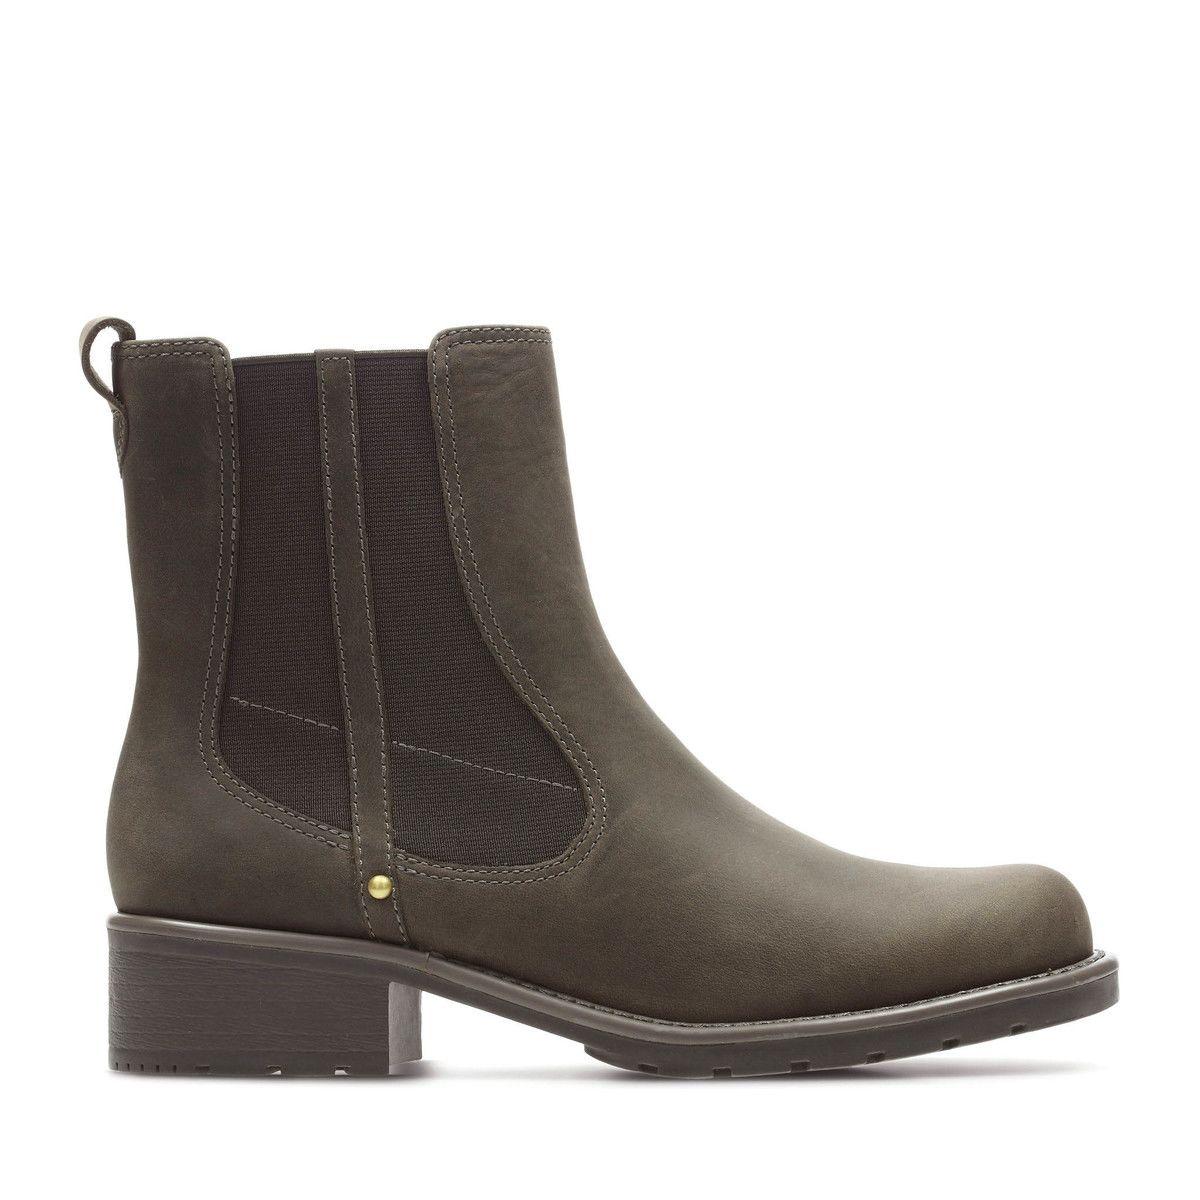 a008b772e29a Clarks Chelsea Boots - KHAK - 3875 54D ORINOCO CLUB